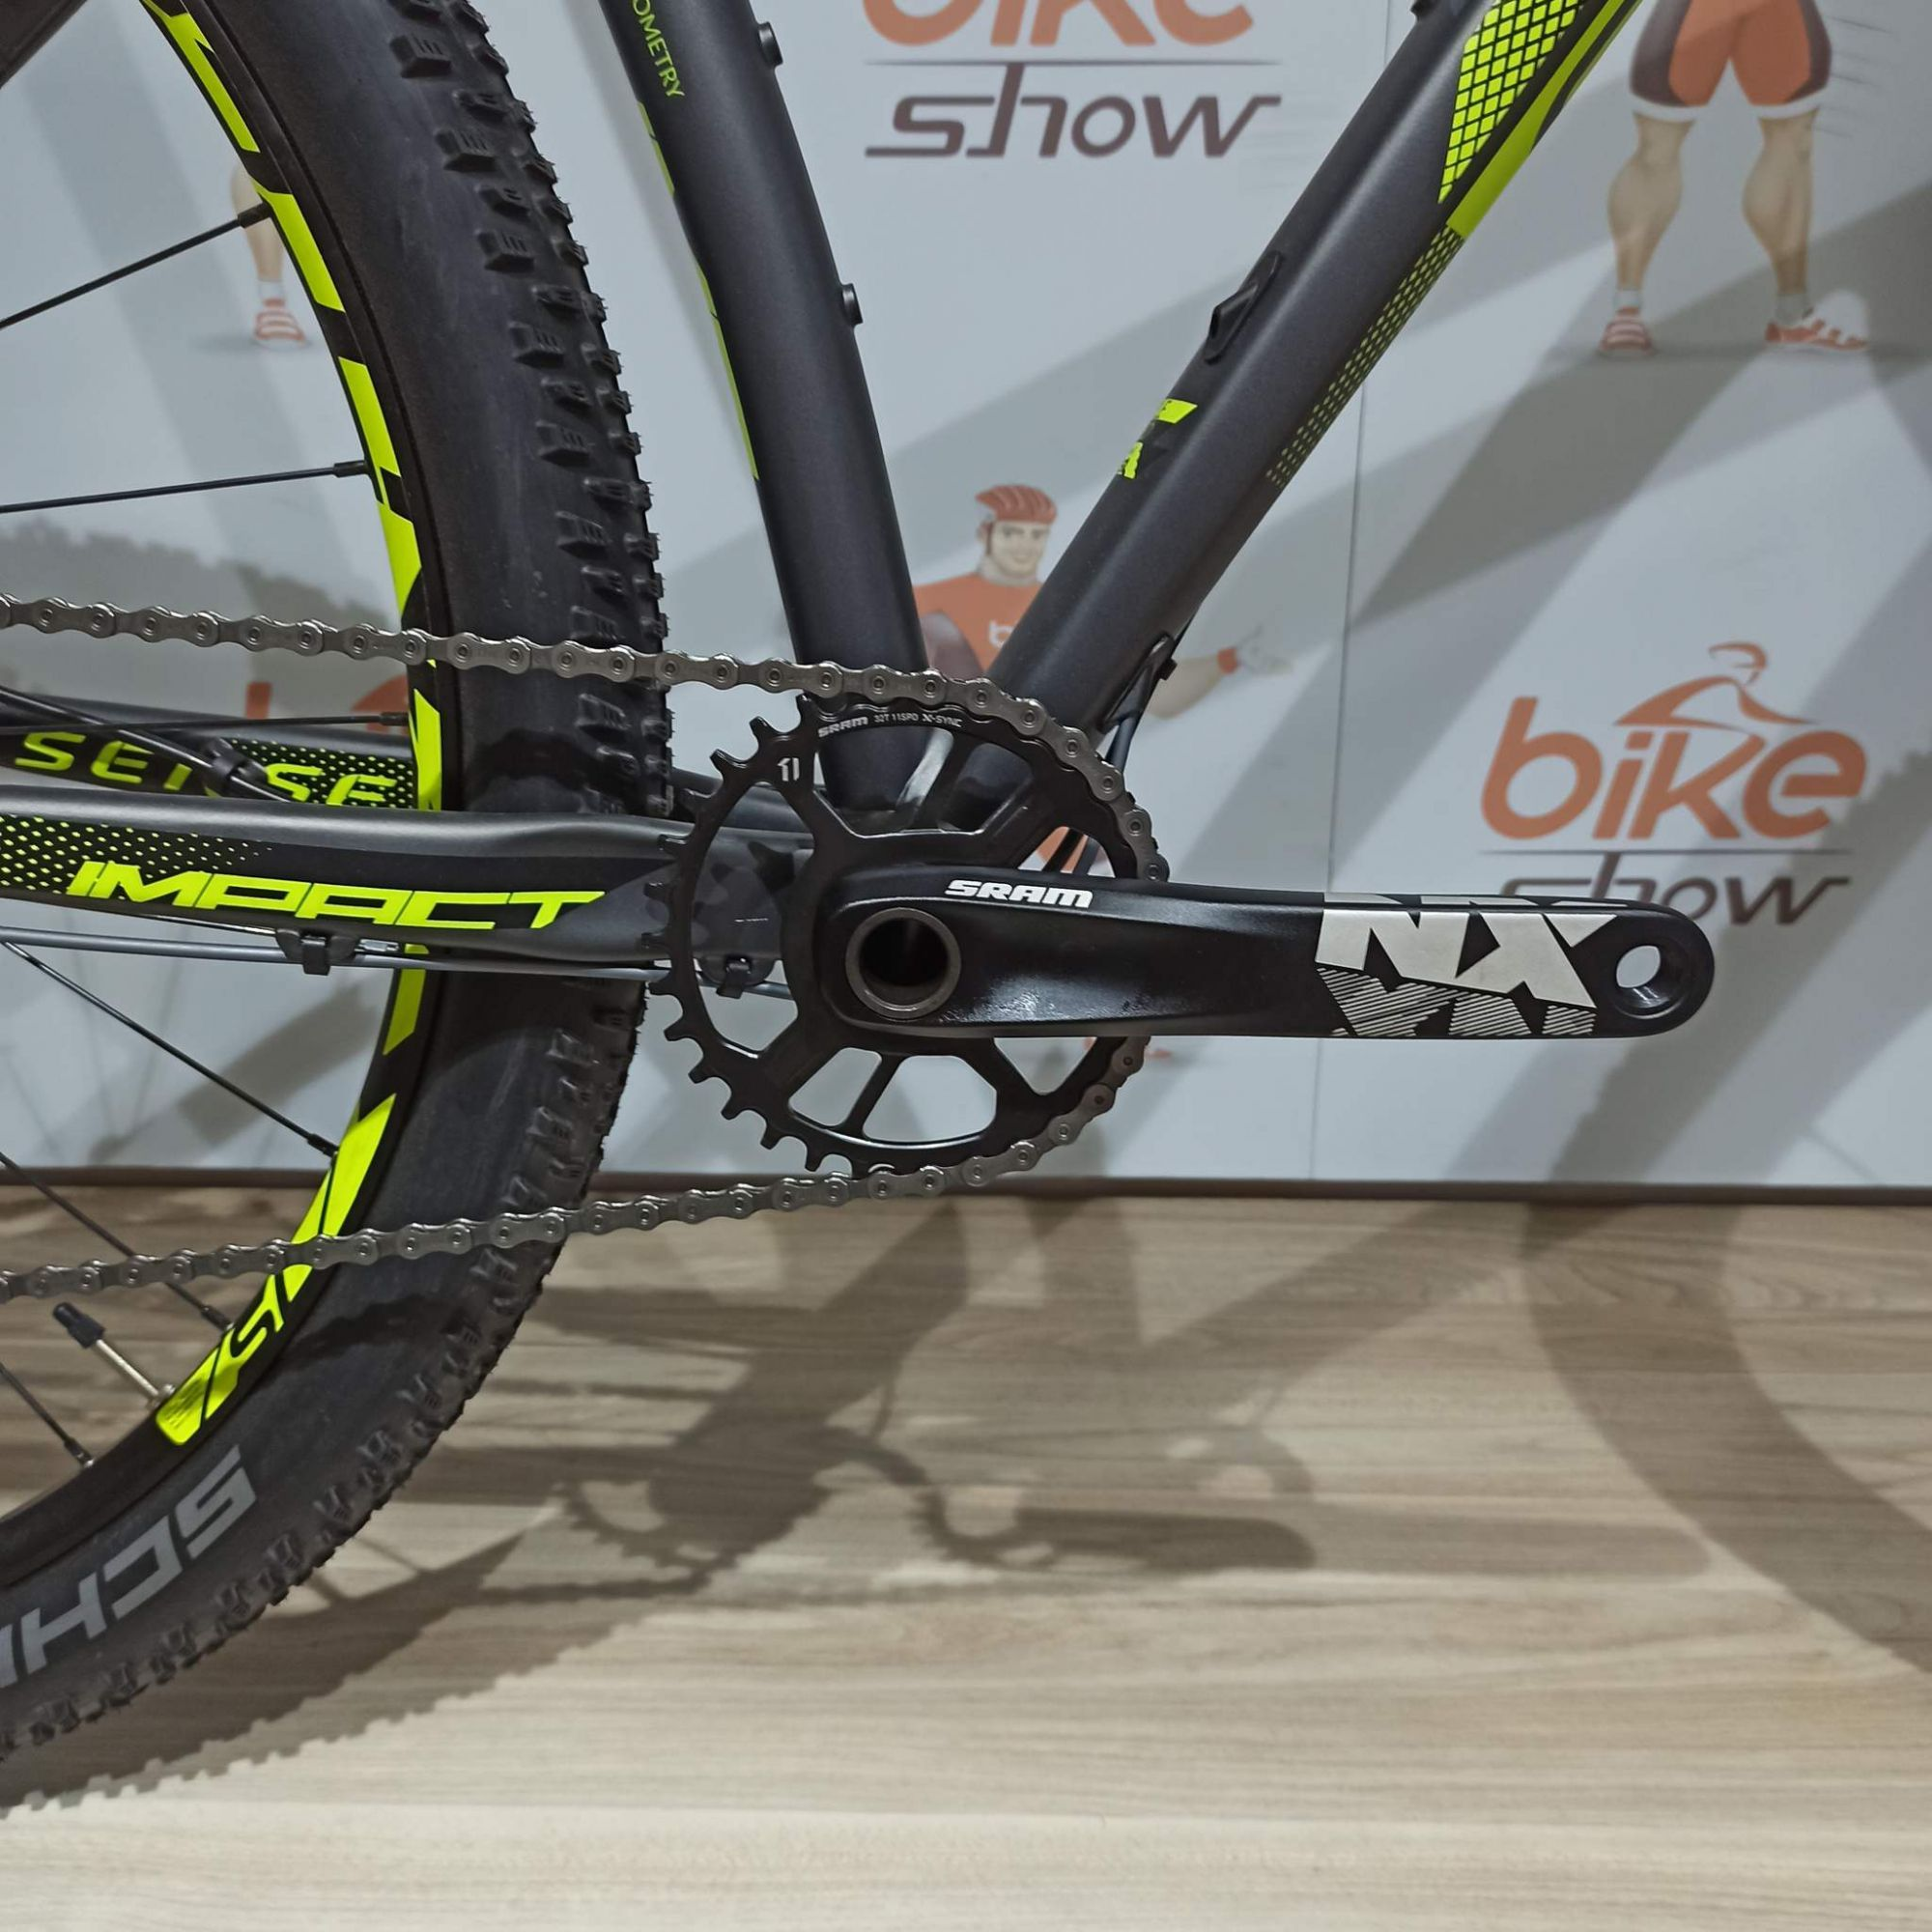 Bicicleta SENSE Impact SL aro 29 ano 2019 - Upgrade 12v Sram NX - Grupo Superior ao modelo 2020